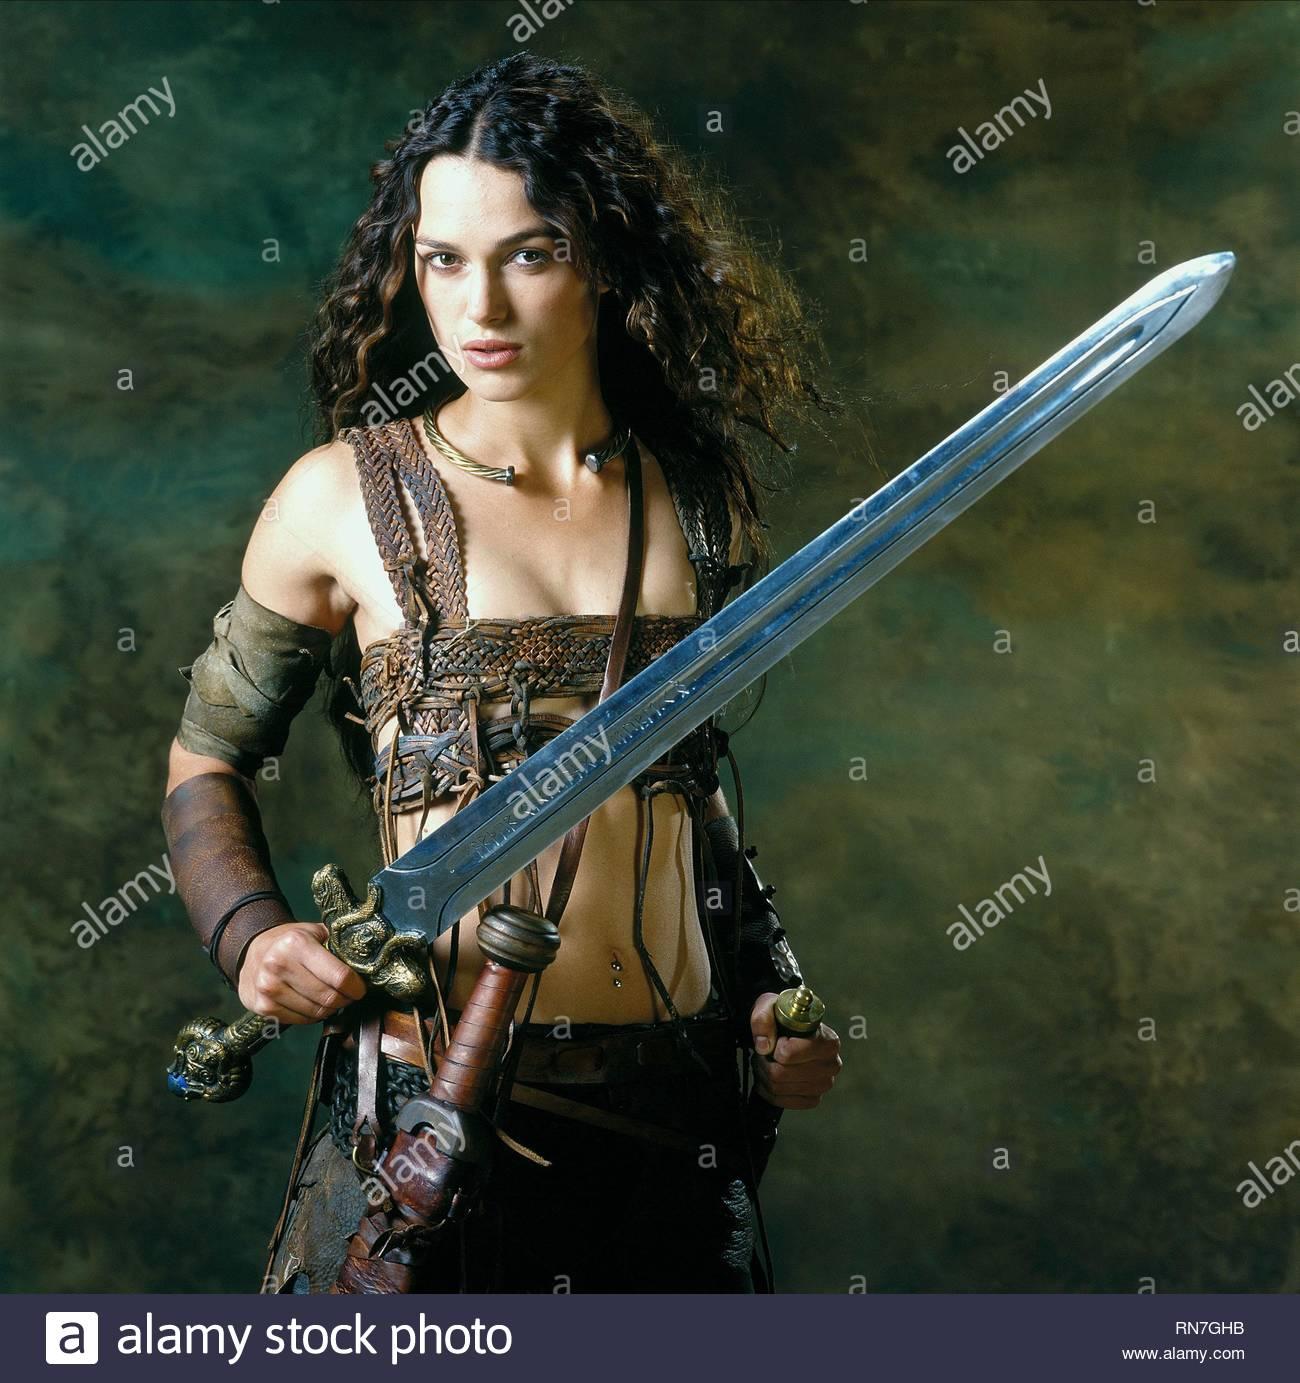 Keira Knightley King Arthur 2004 Stock Photo Alamy